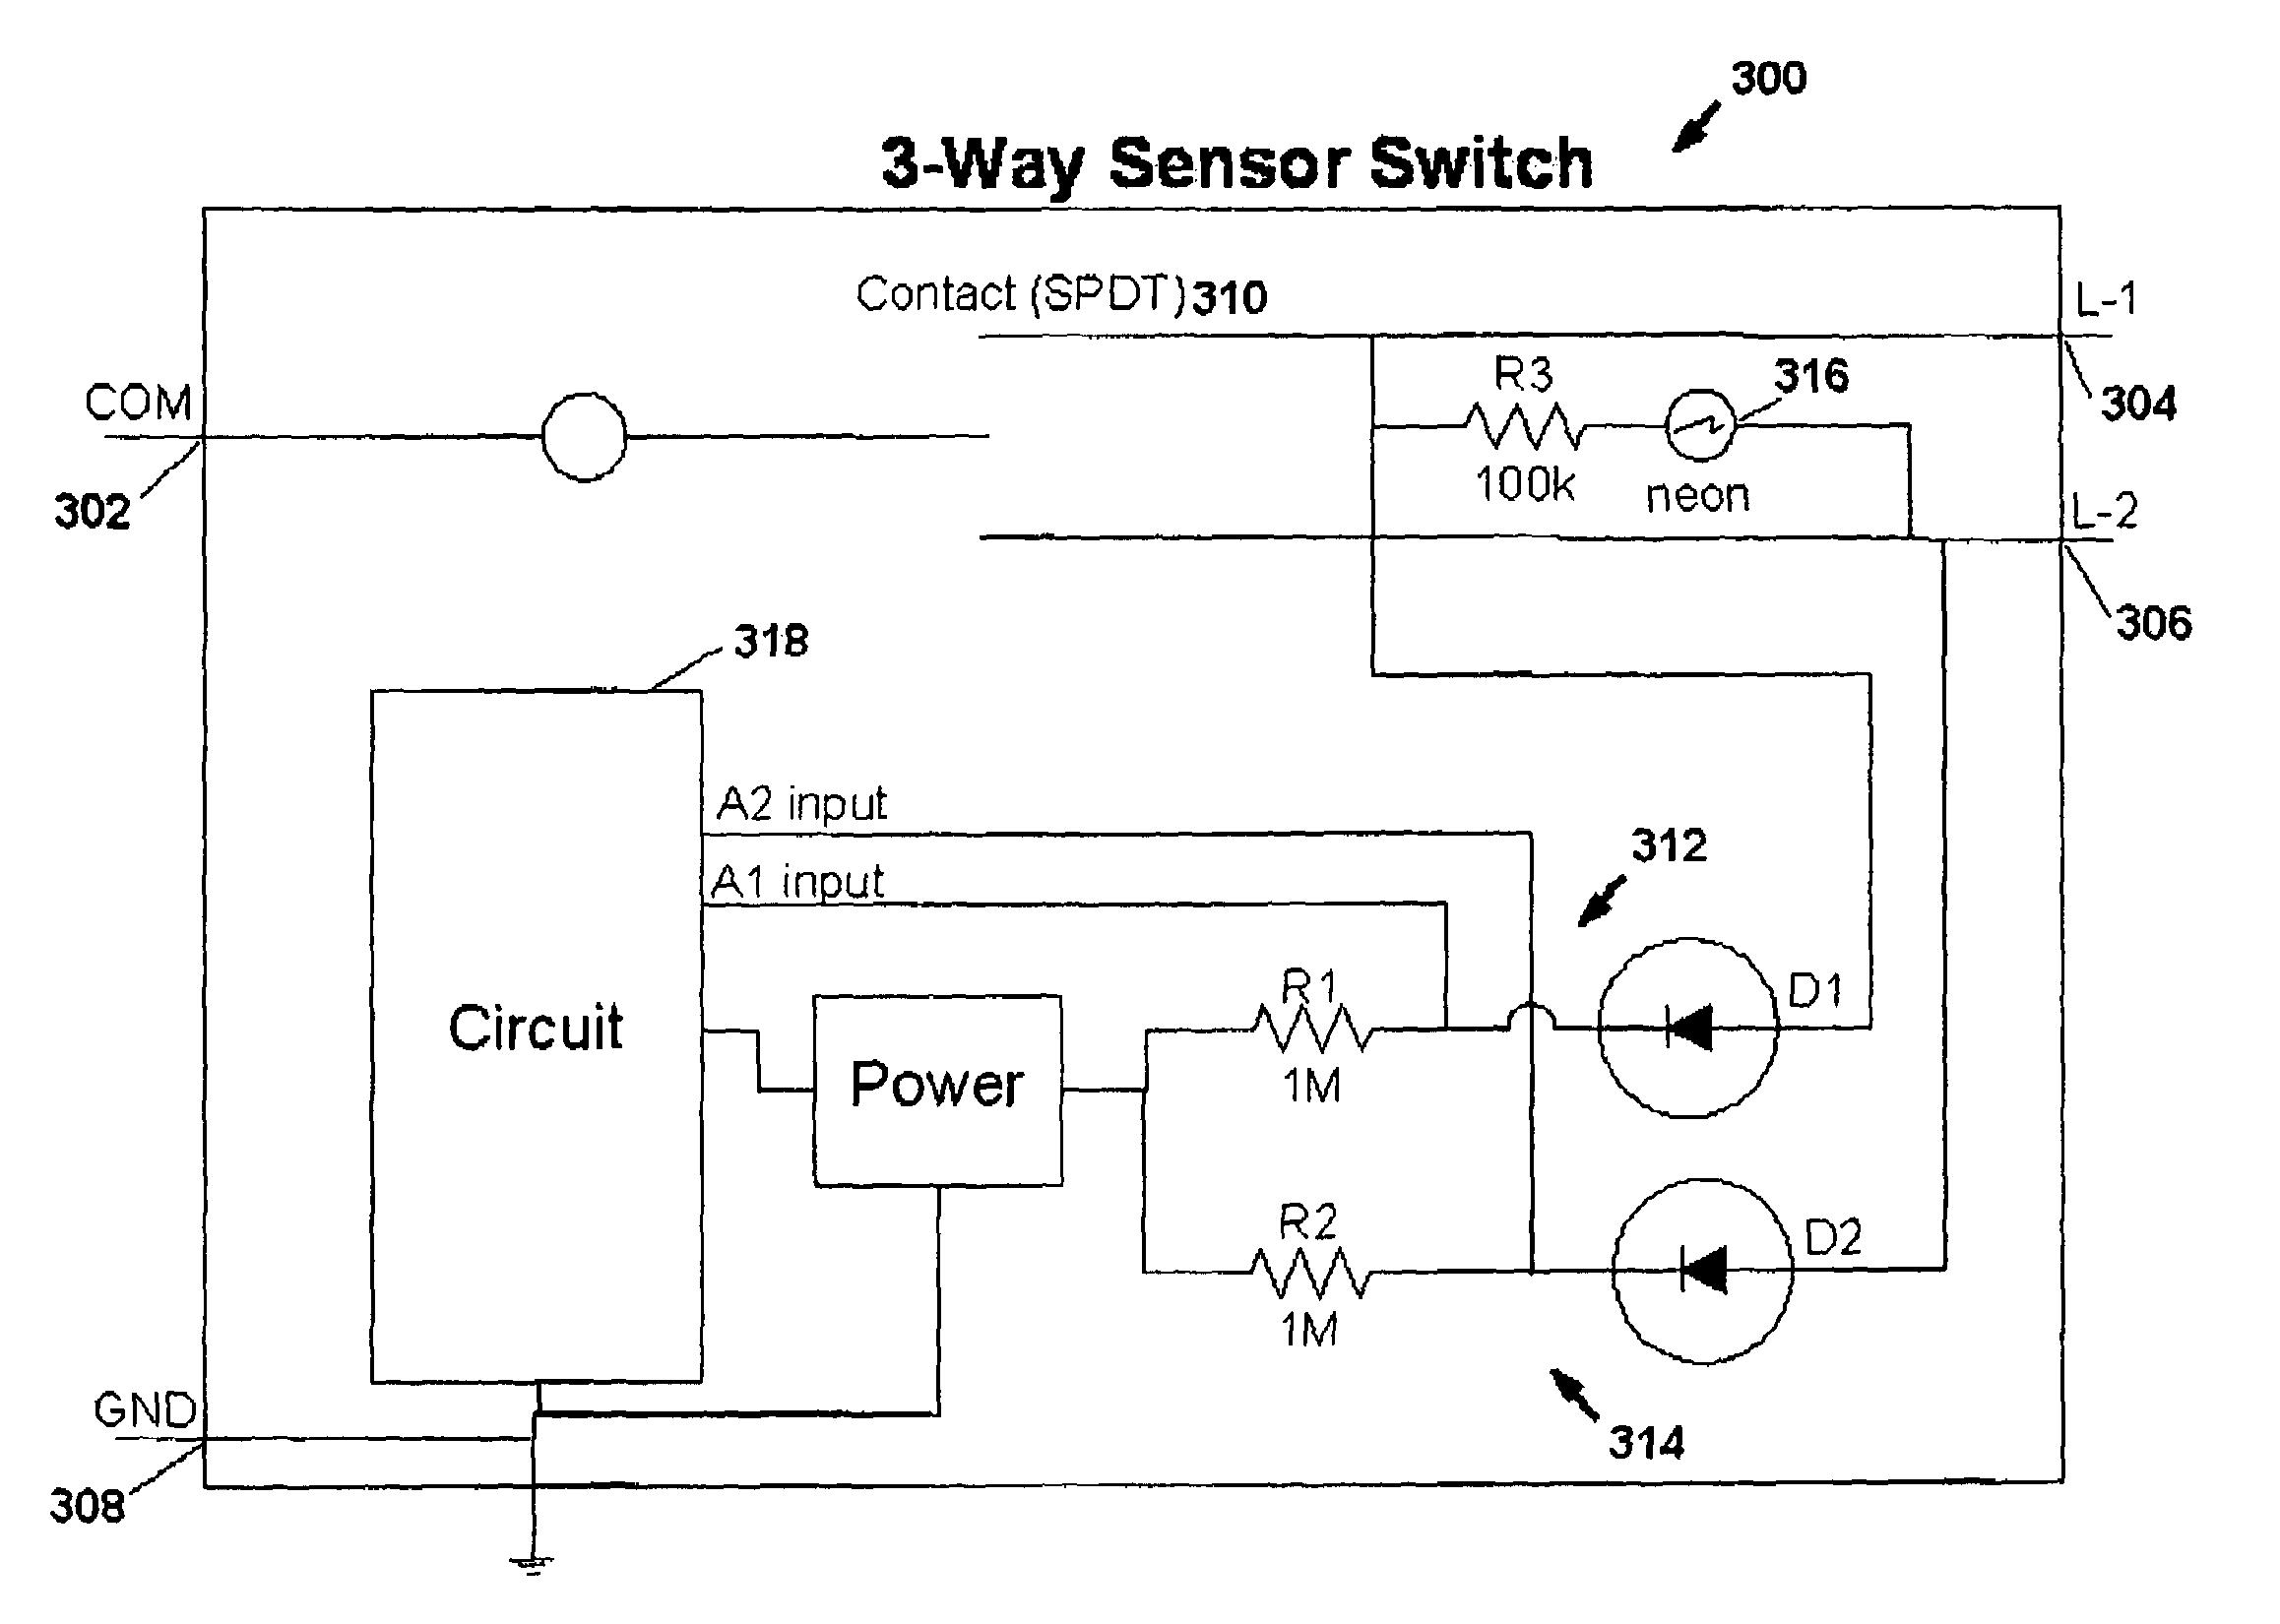 Unique Wiring Diagram For Outdoor Motion Detector Light Diagrams Digramssample Diagramimages Wiringdiagramsample Wiringdiag Motion Detector Diagram Sensor